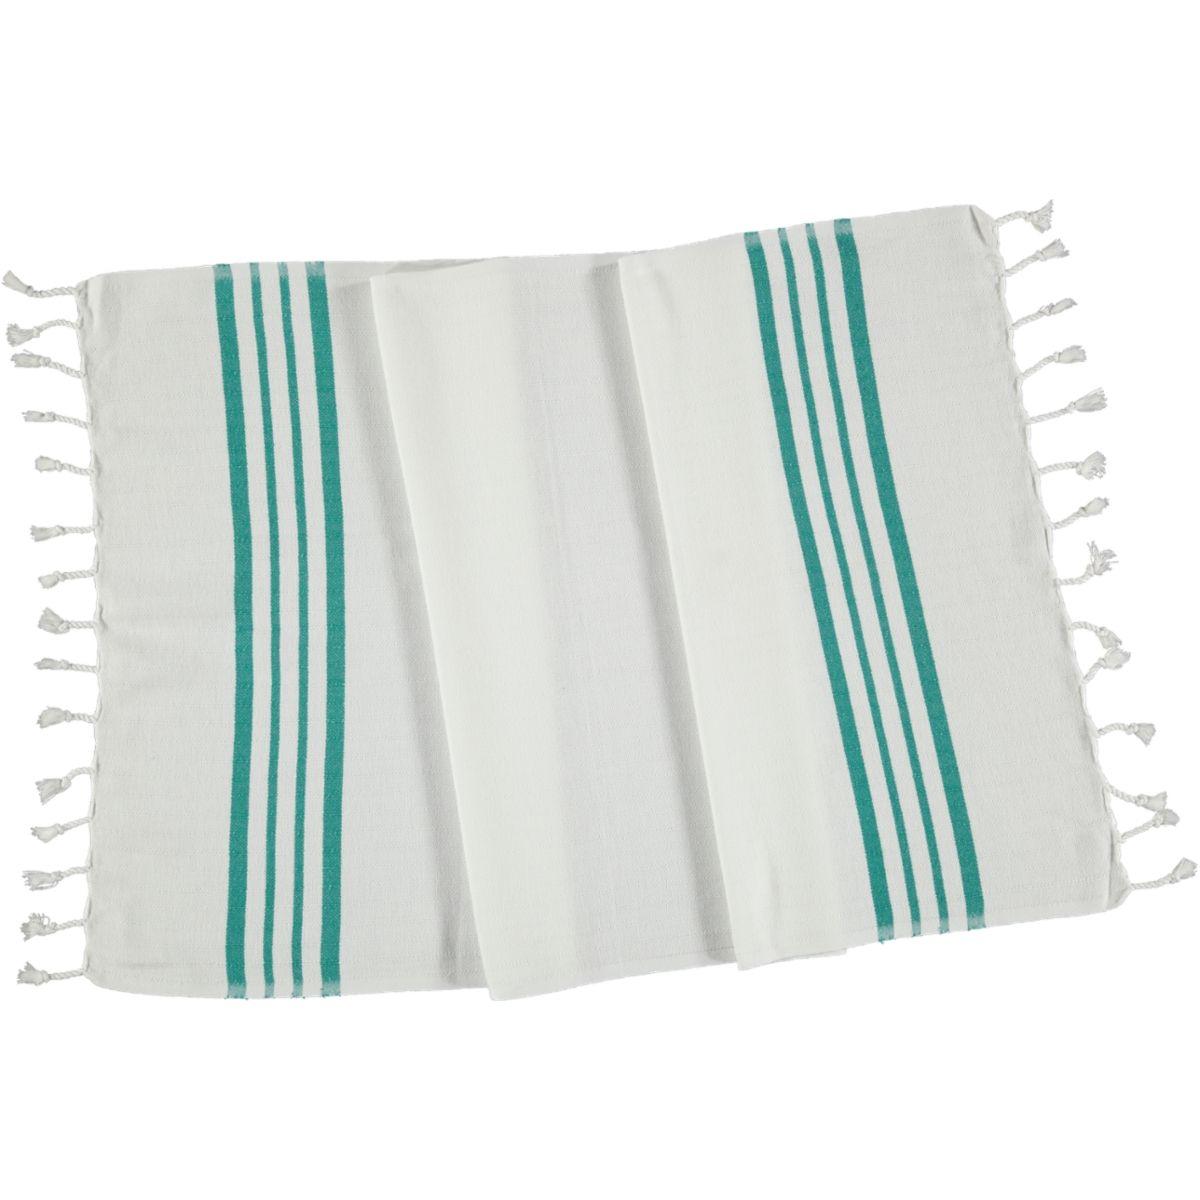 Peshkir - White Sultan / Fanfare Green Stripes